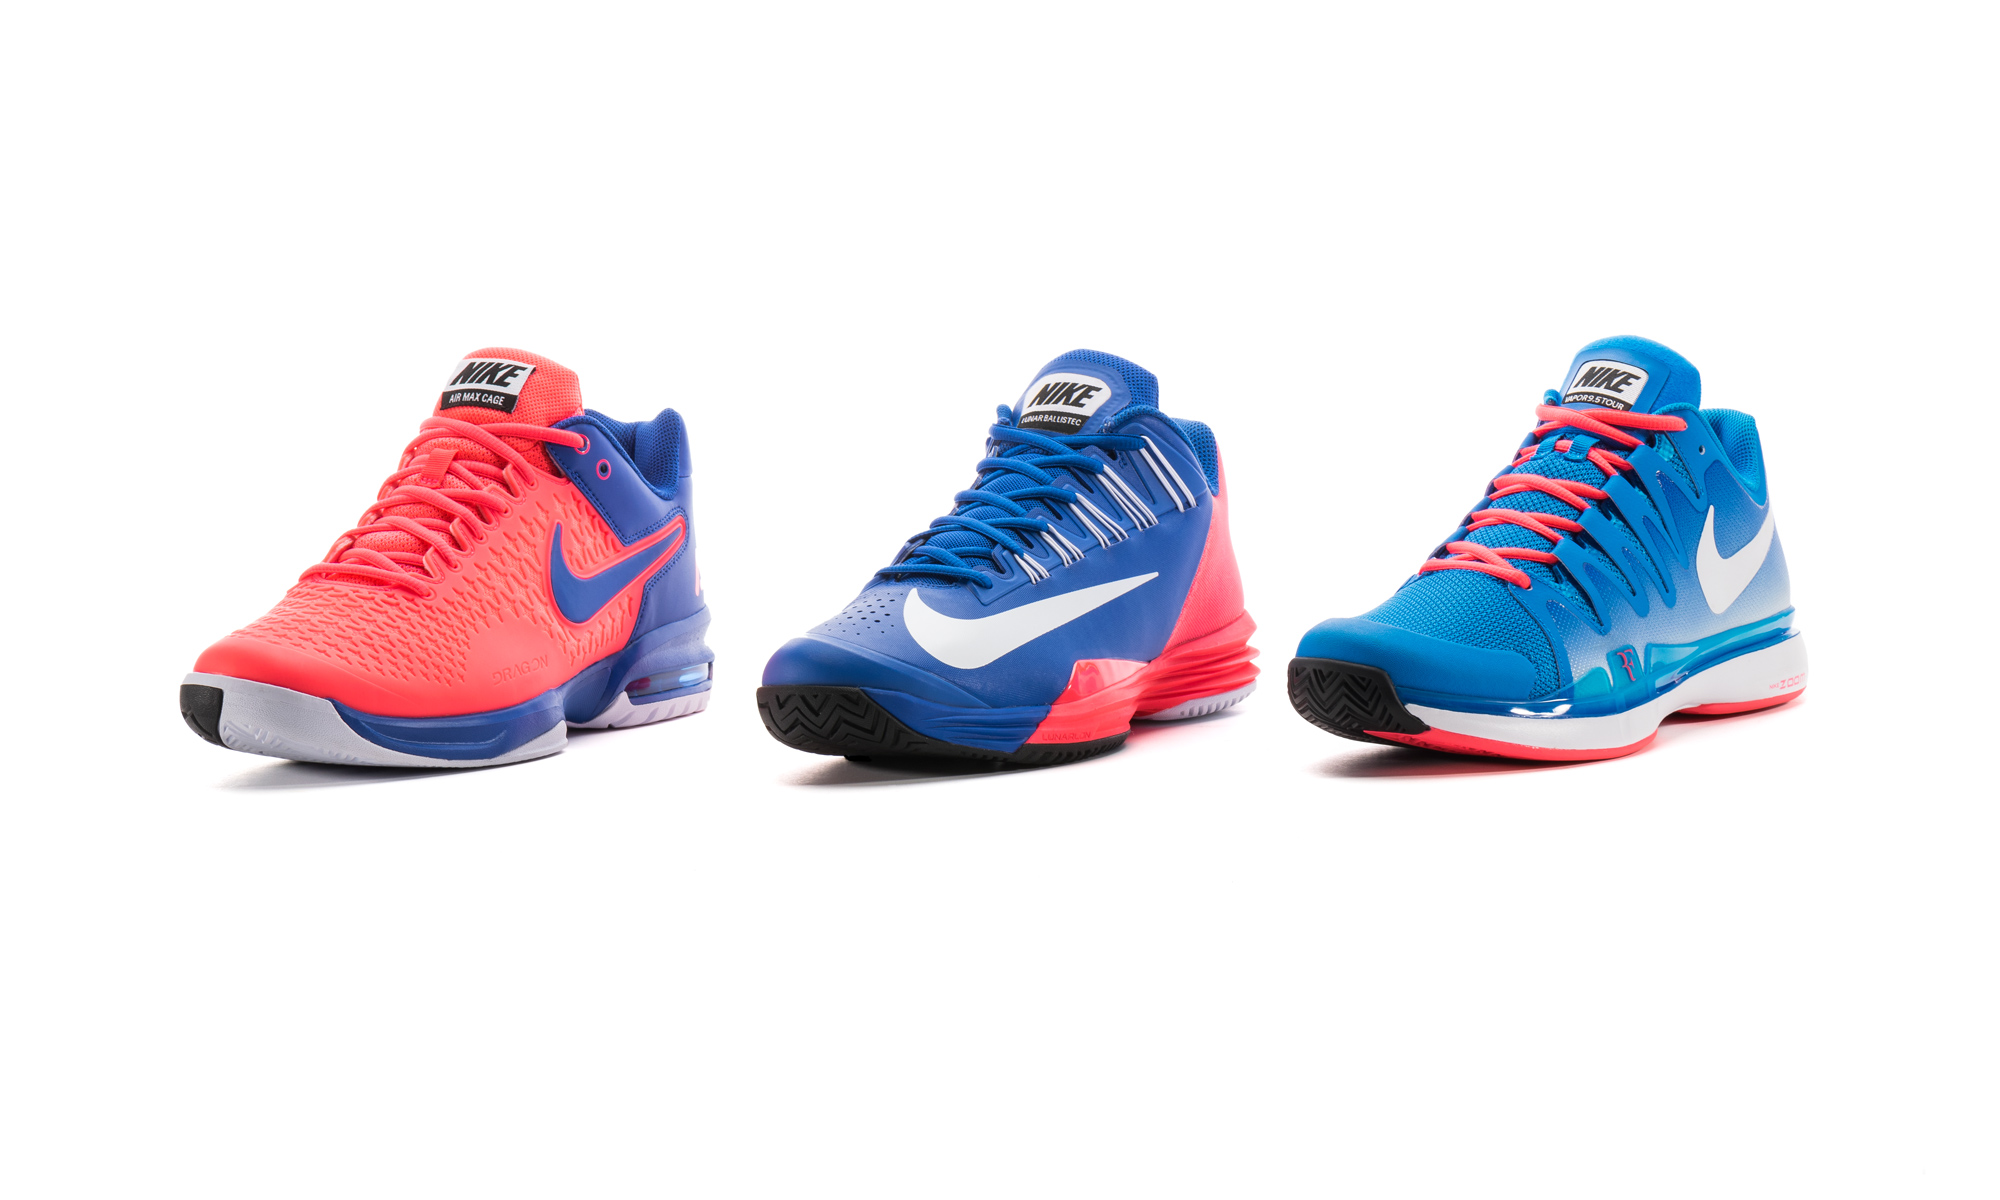 official photos 7849b 8c831 tennis shoes nike for men